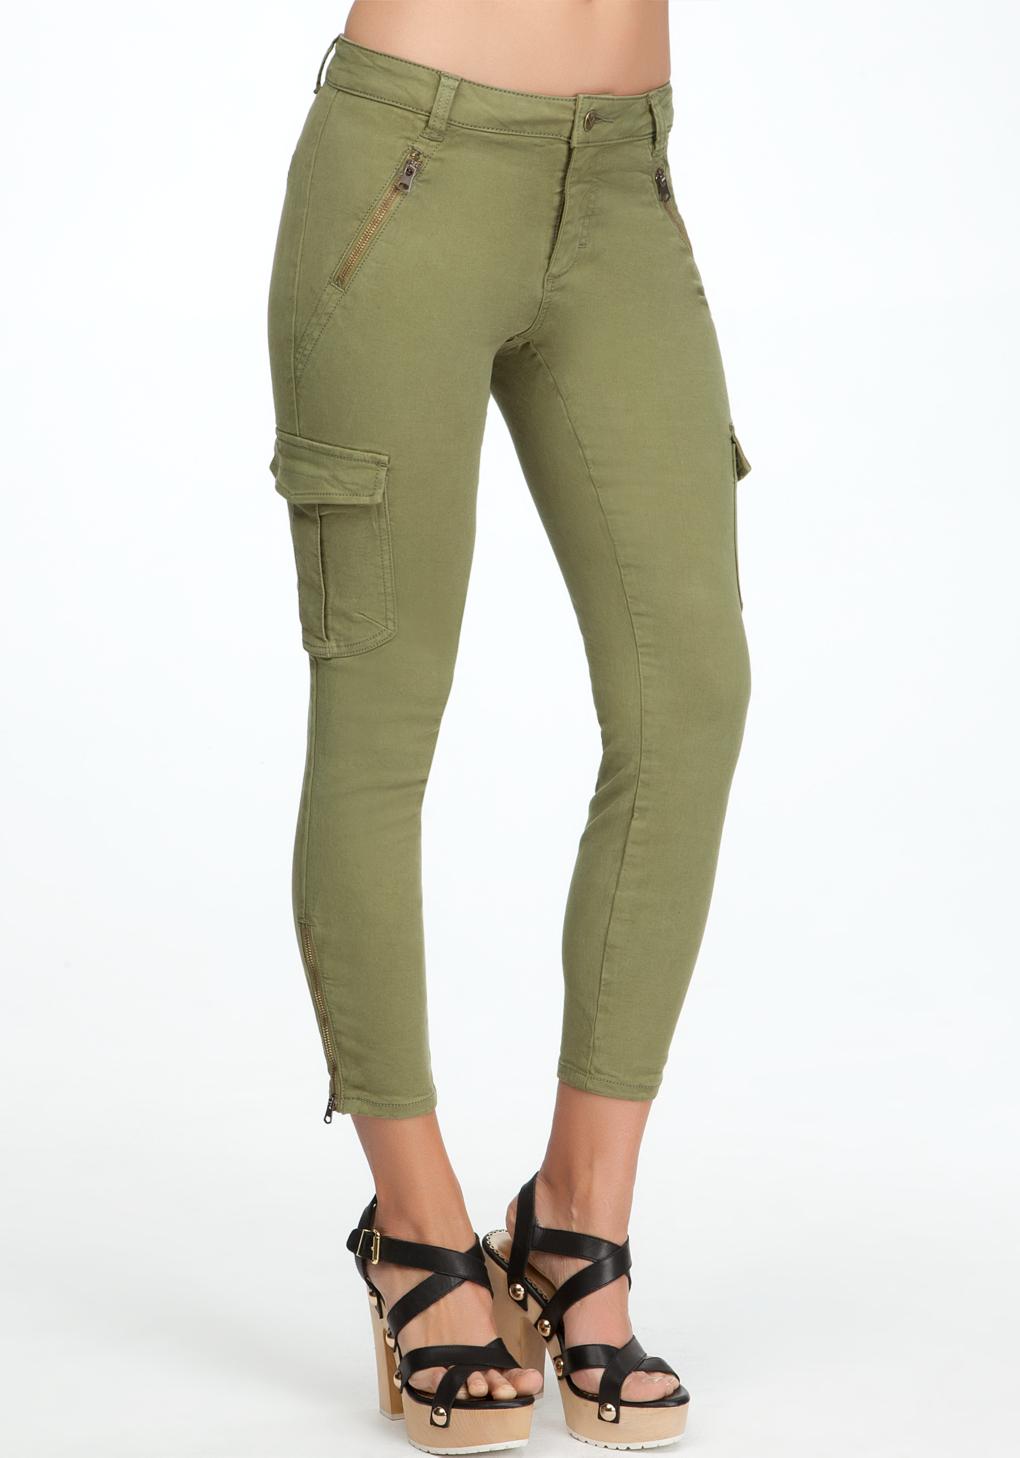 Wonderful Girls And Woman Uniform Skinny Khaki Cargo Pants  EBay